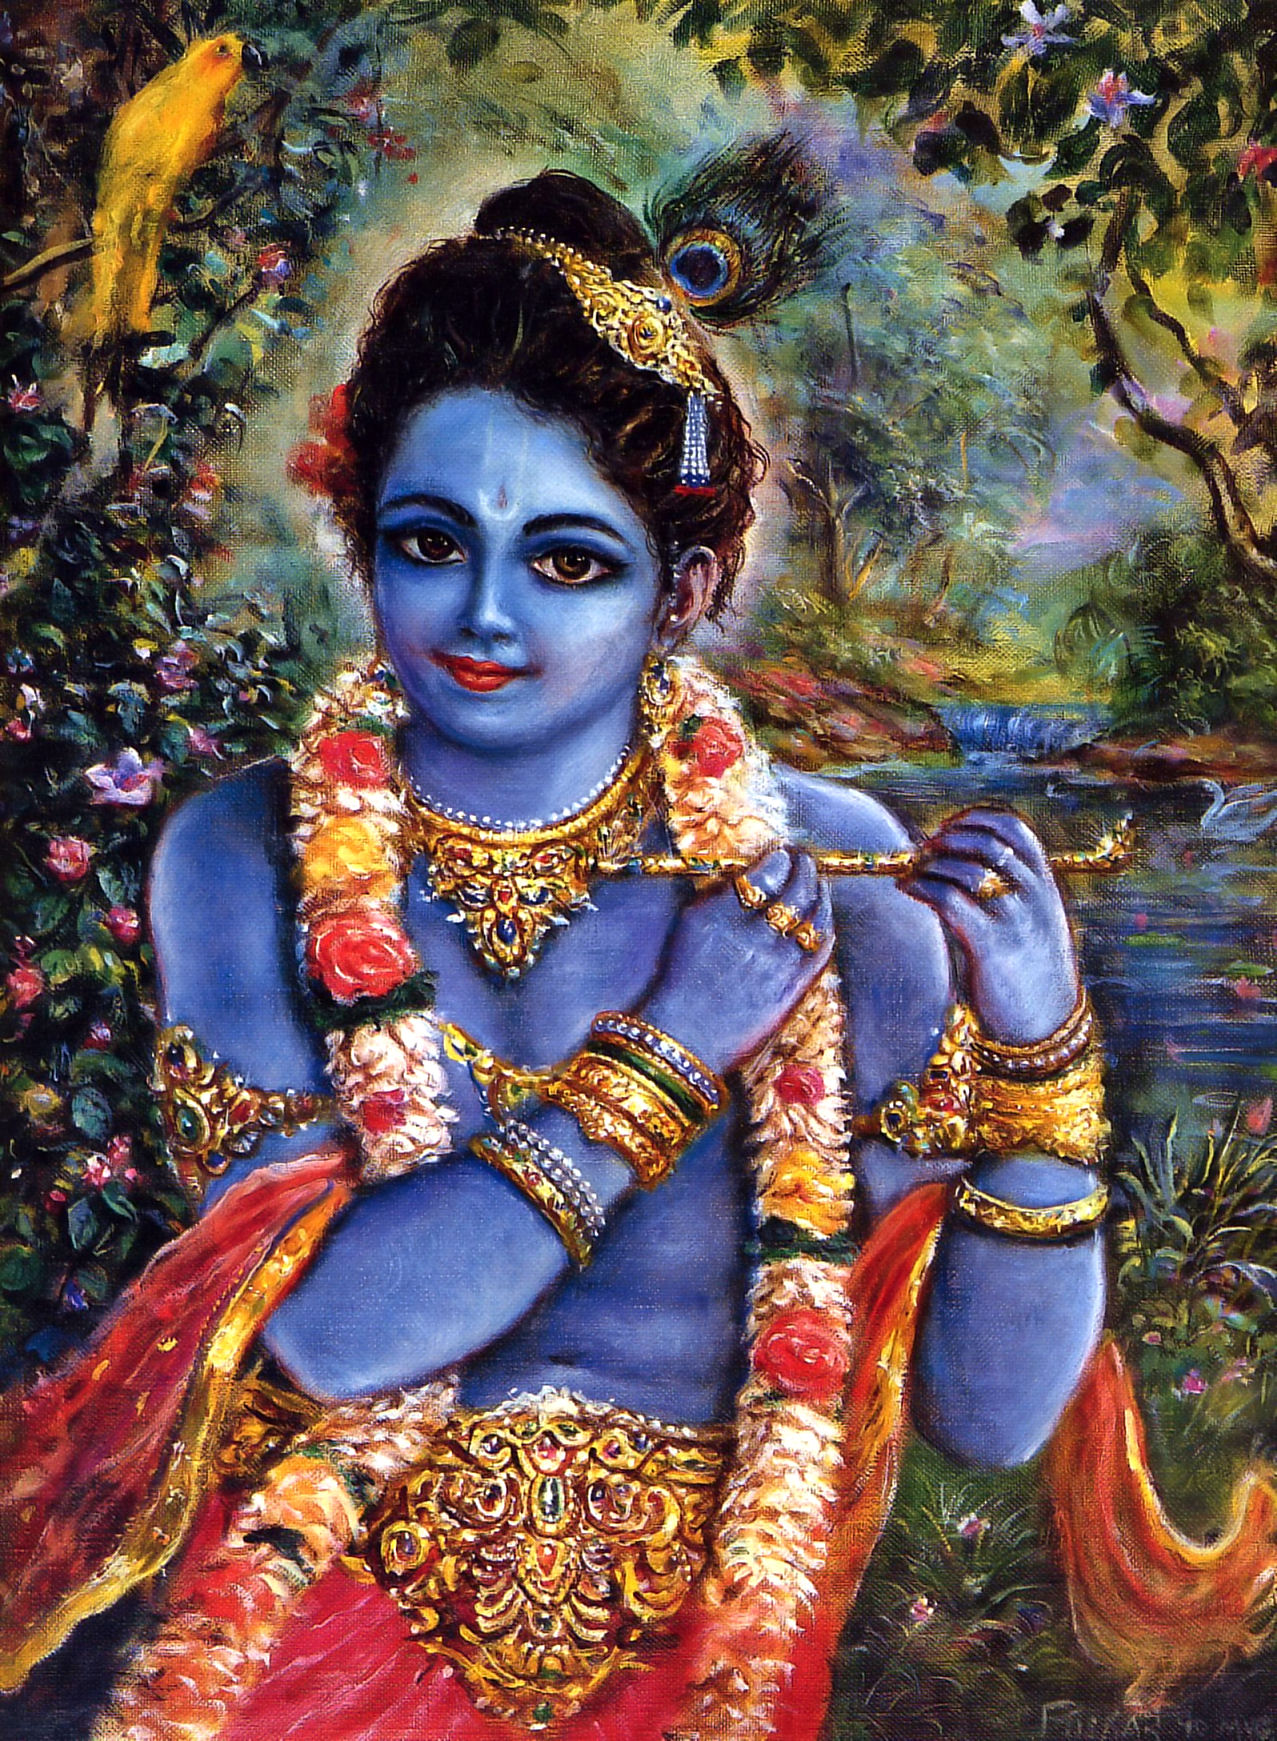 Uncategorized beautiful radha krishna hd wallpaper shri krishna and radha rani beautiful lighting effects hd wallpaper - Krishna Shyamasundara